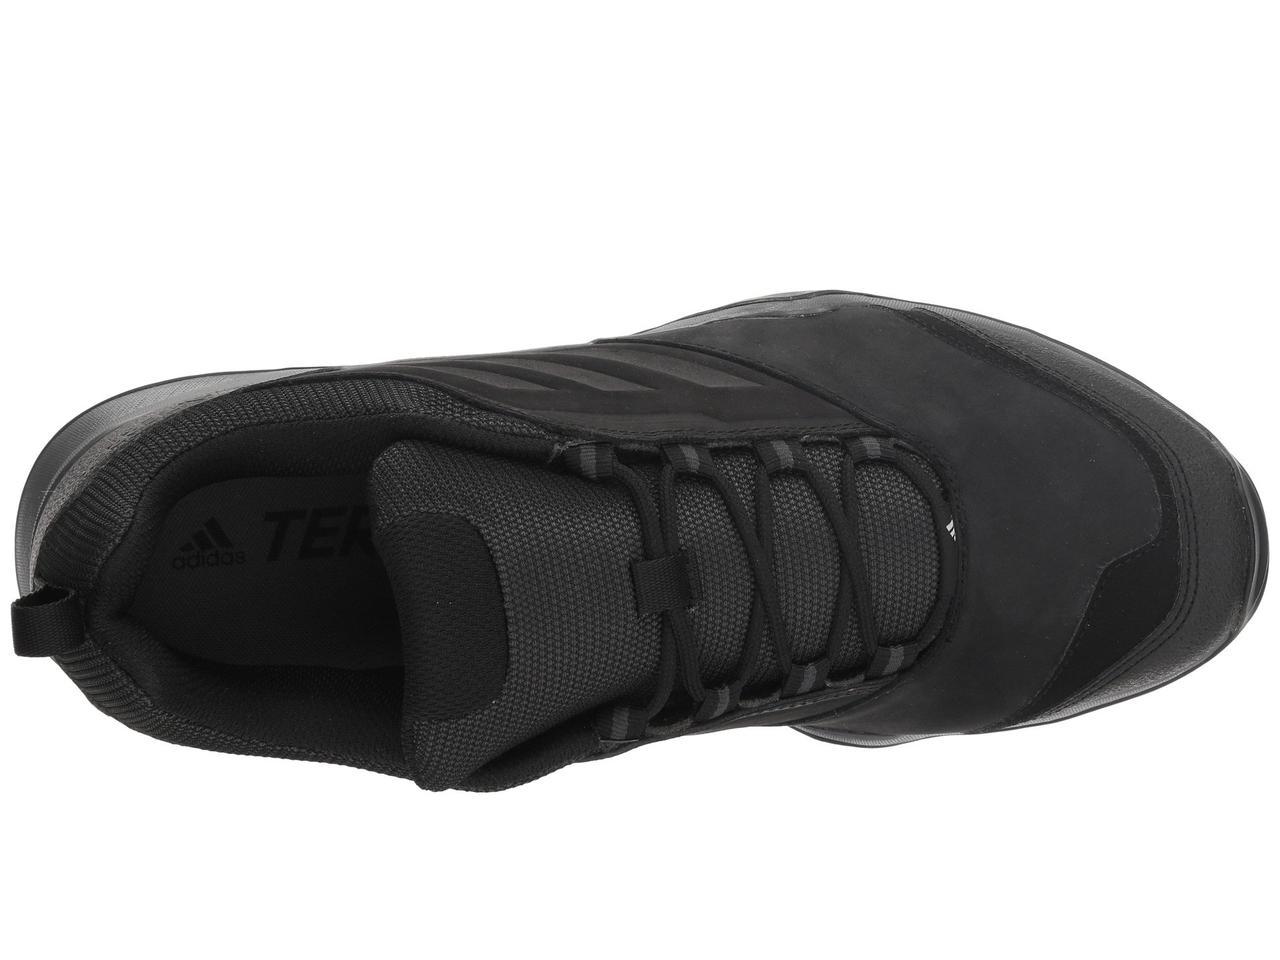 70426078b3a ... Кроссовки Кеды (Оригинал) adidas Outdoor Terrex Brushwood Leather  Black Black Grey ...